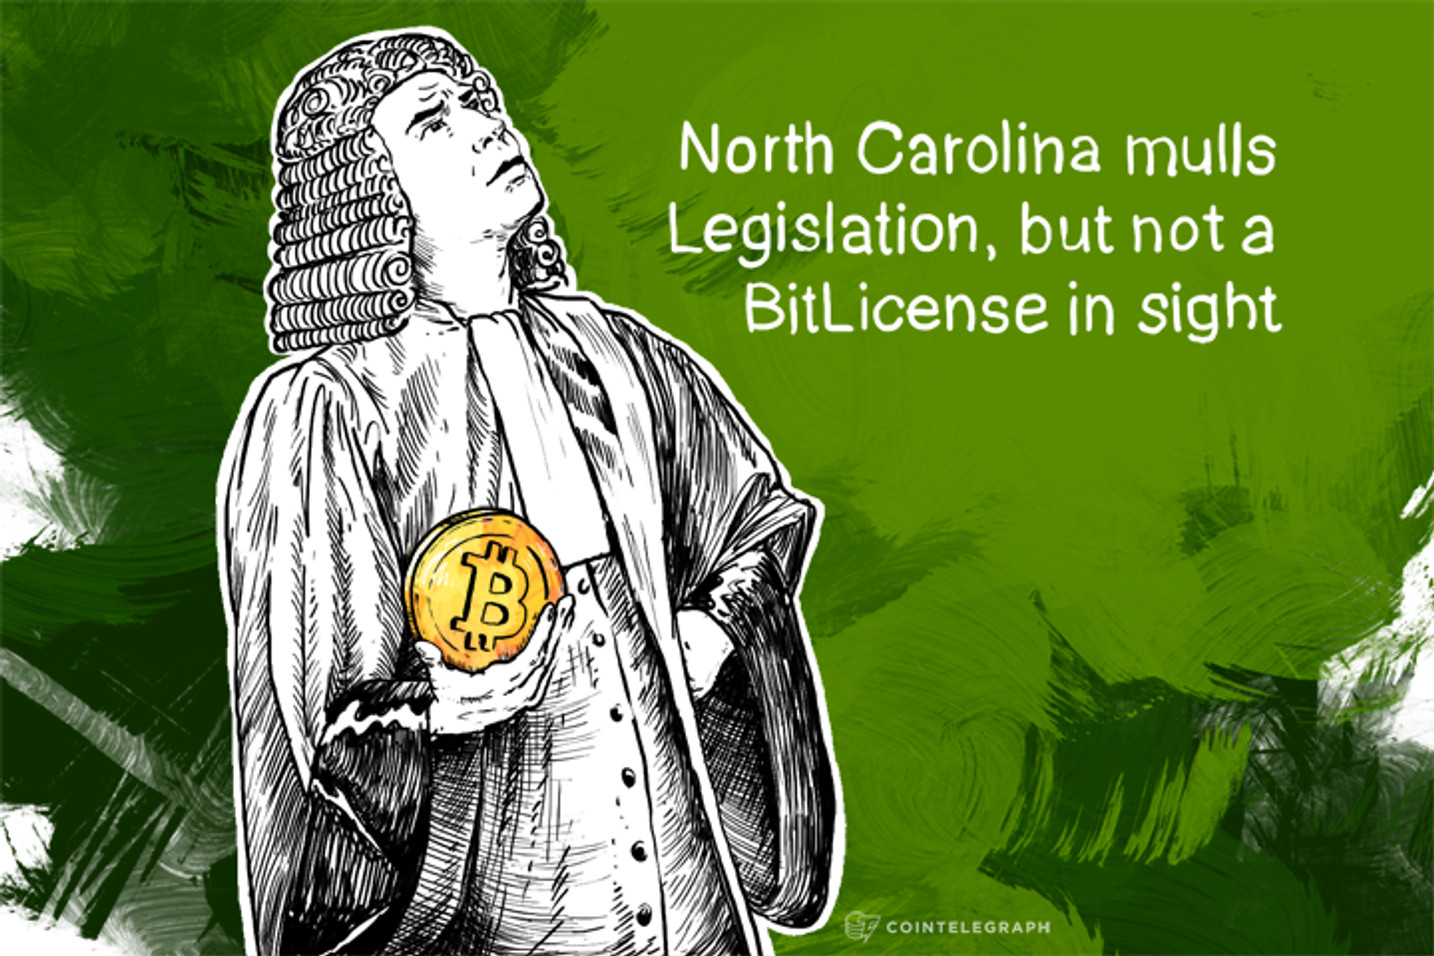 North Carolina mulls Legislation, but not a BitLicense in sight